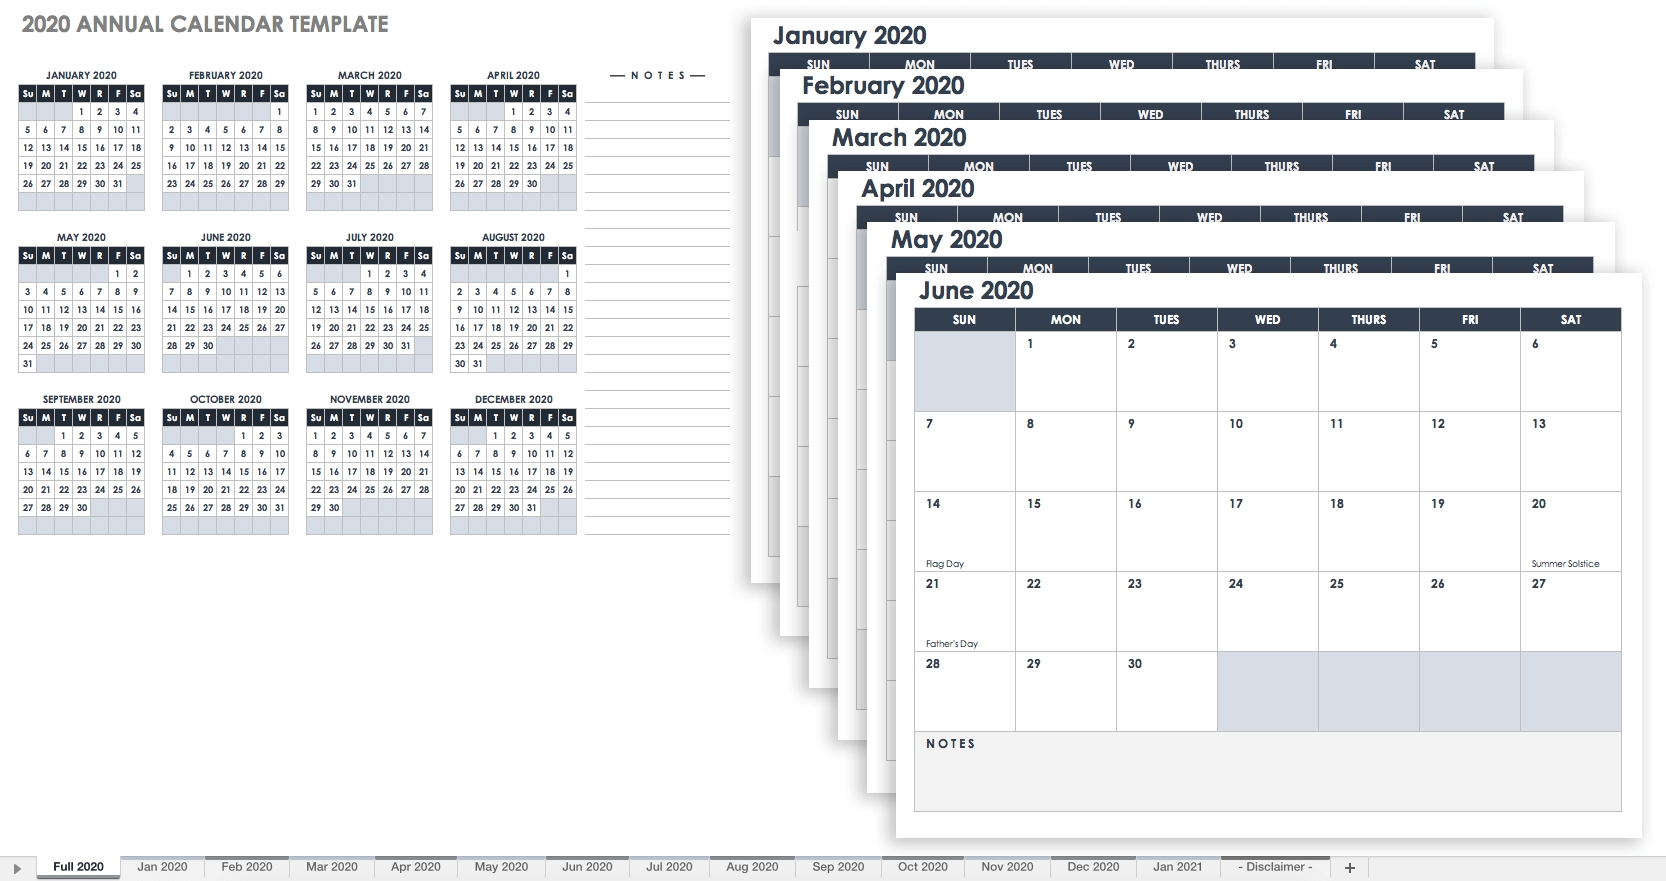 Free Excel Calendar Templates with regard to 2020 Printable Calendar Templates Quarterly